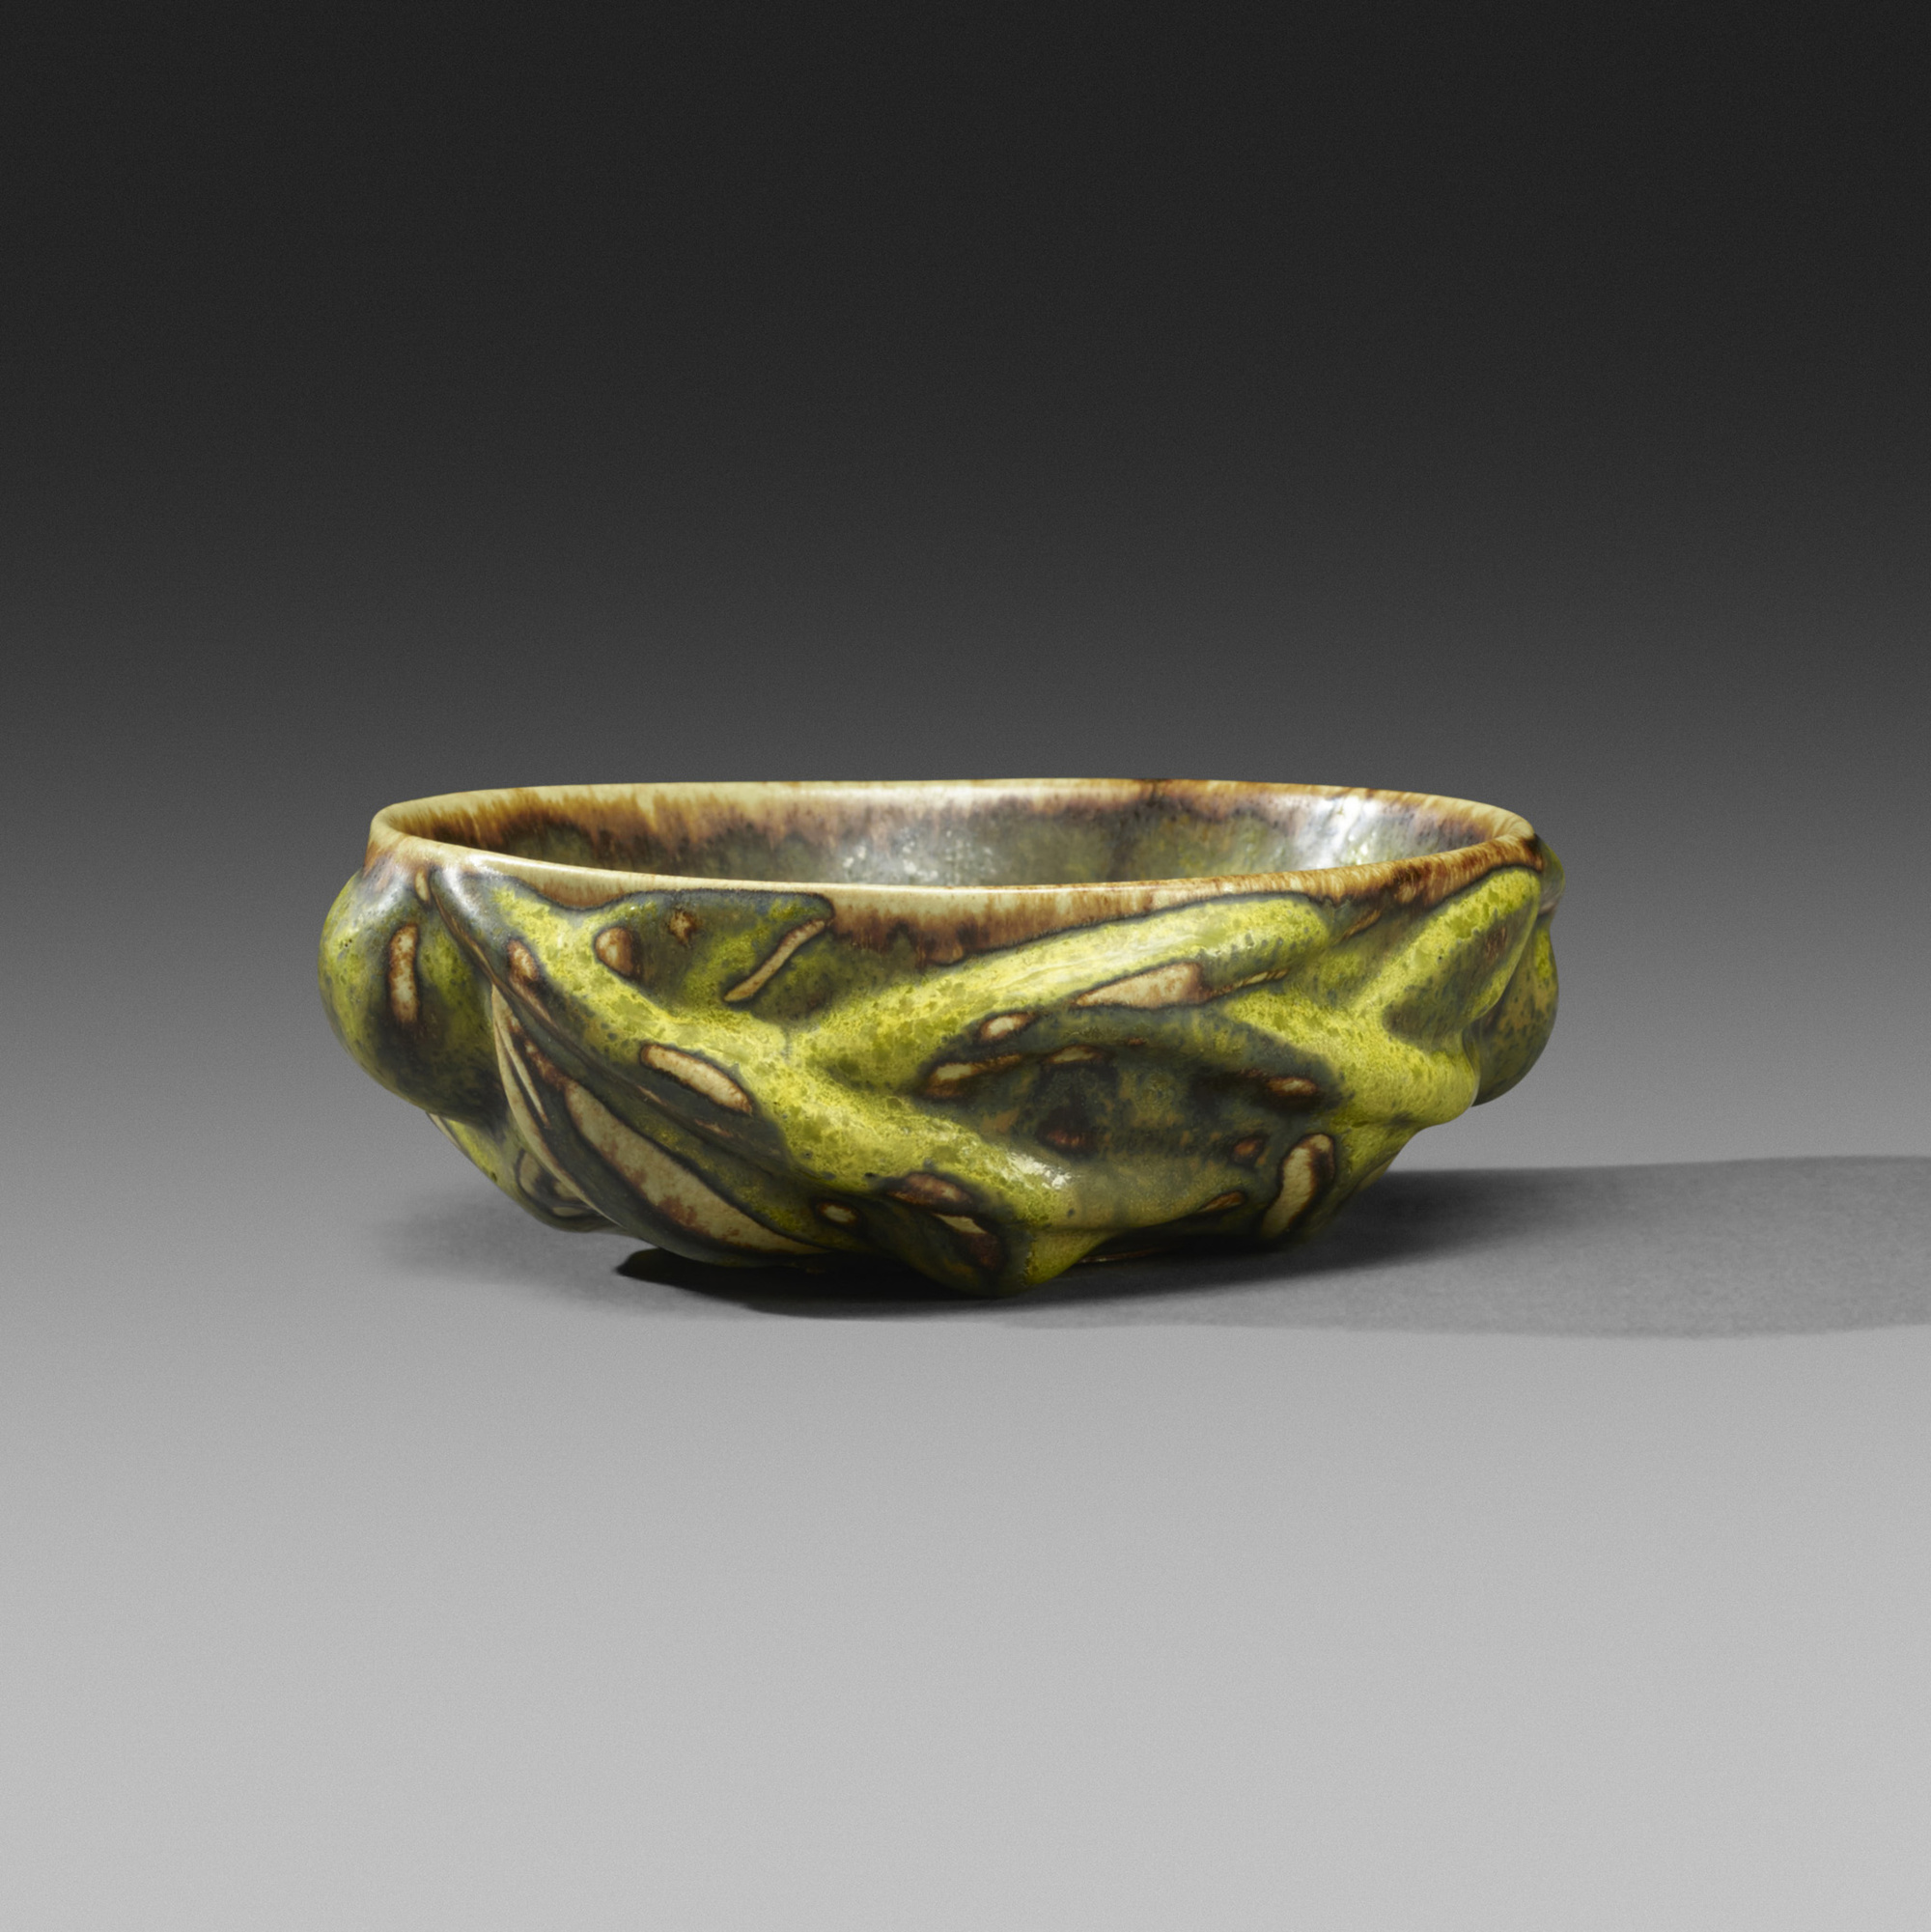 147: Axel Salto / Vine bowl (1 of 2)